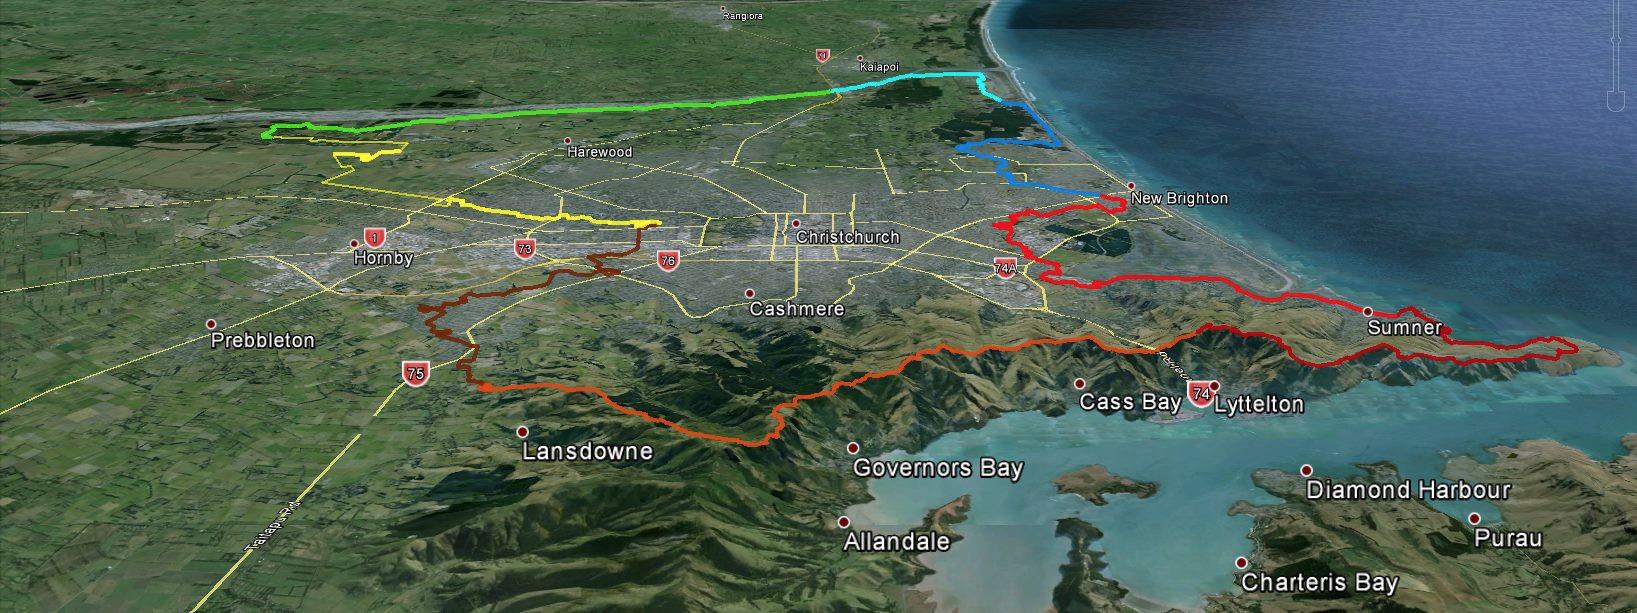 Christchurch 360 Trail flyover